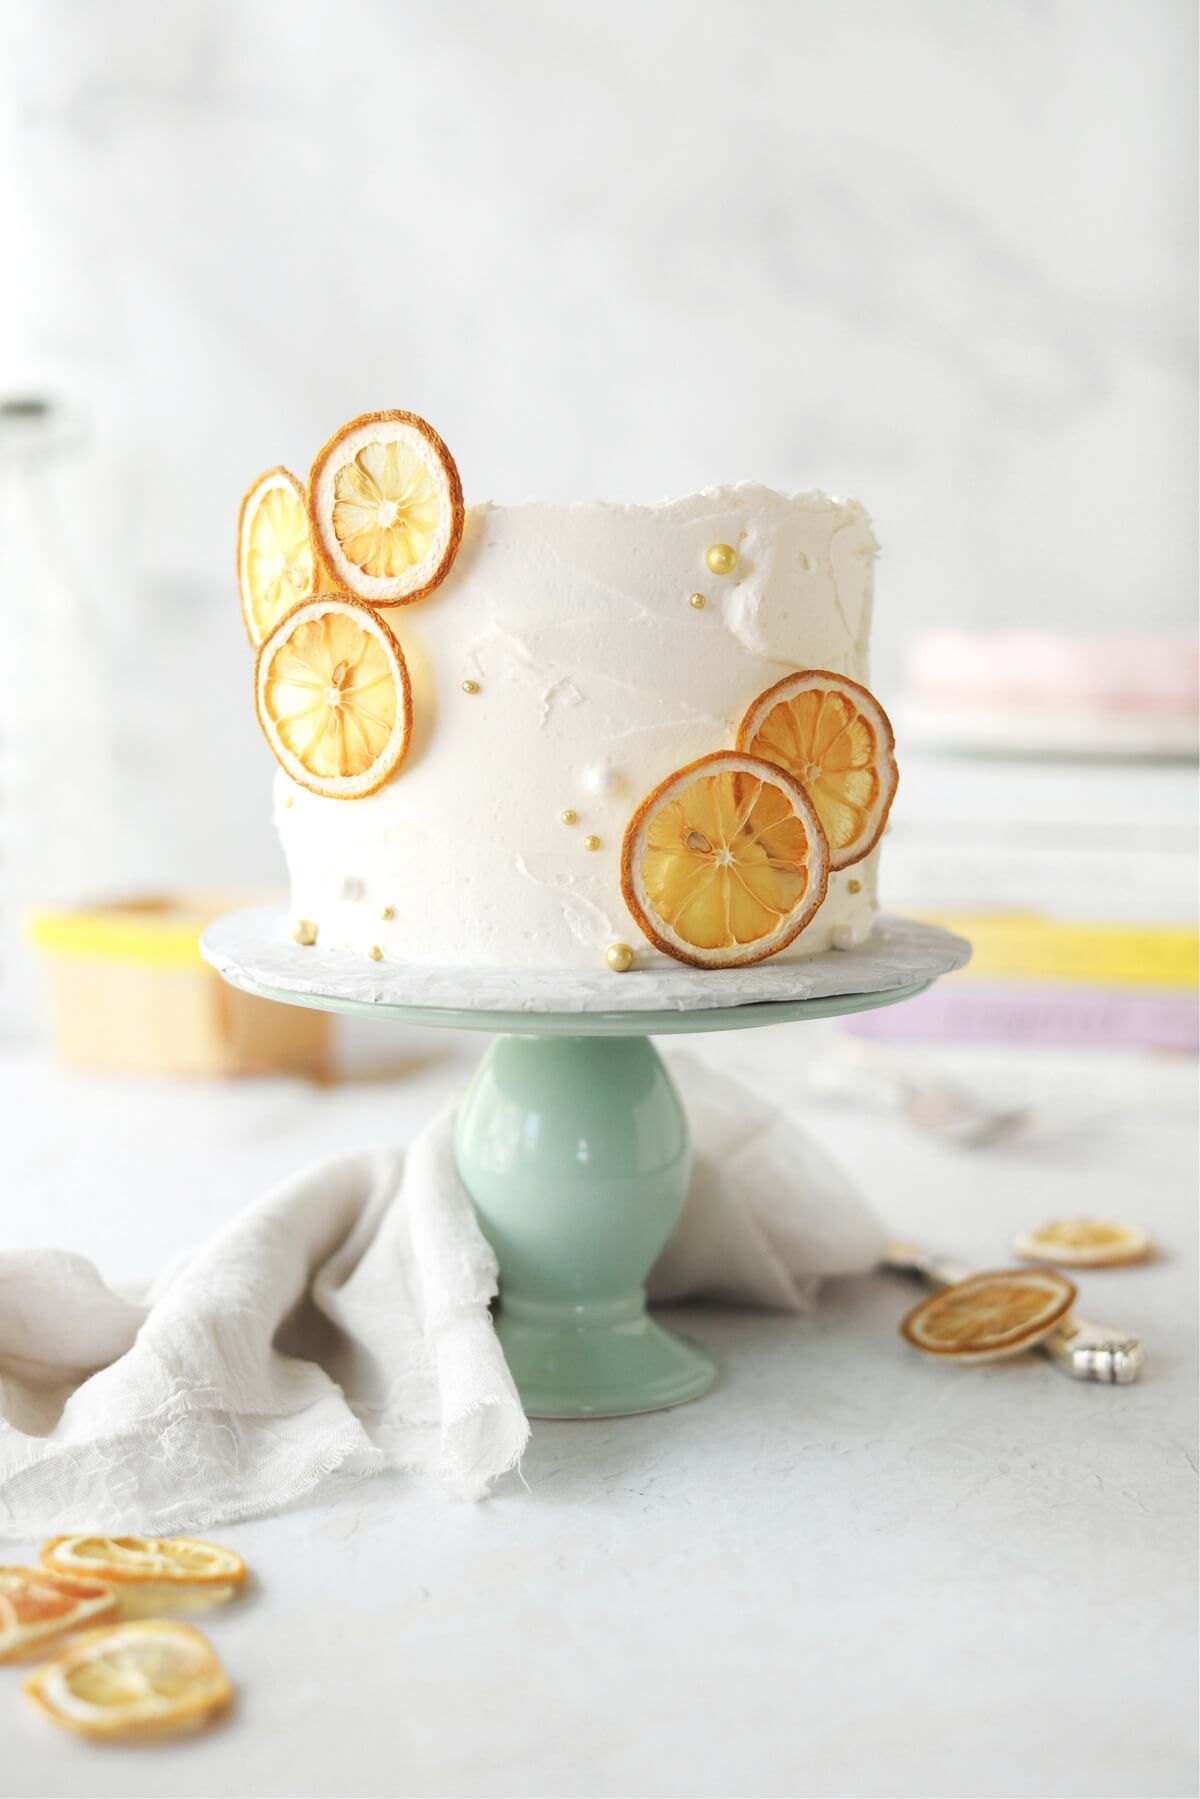 Lemon cake decorated with dried lemon slices.